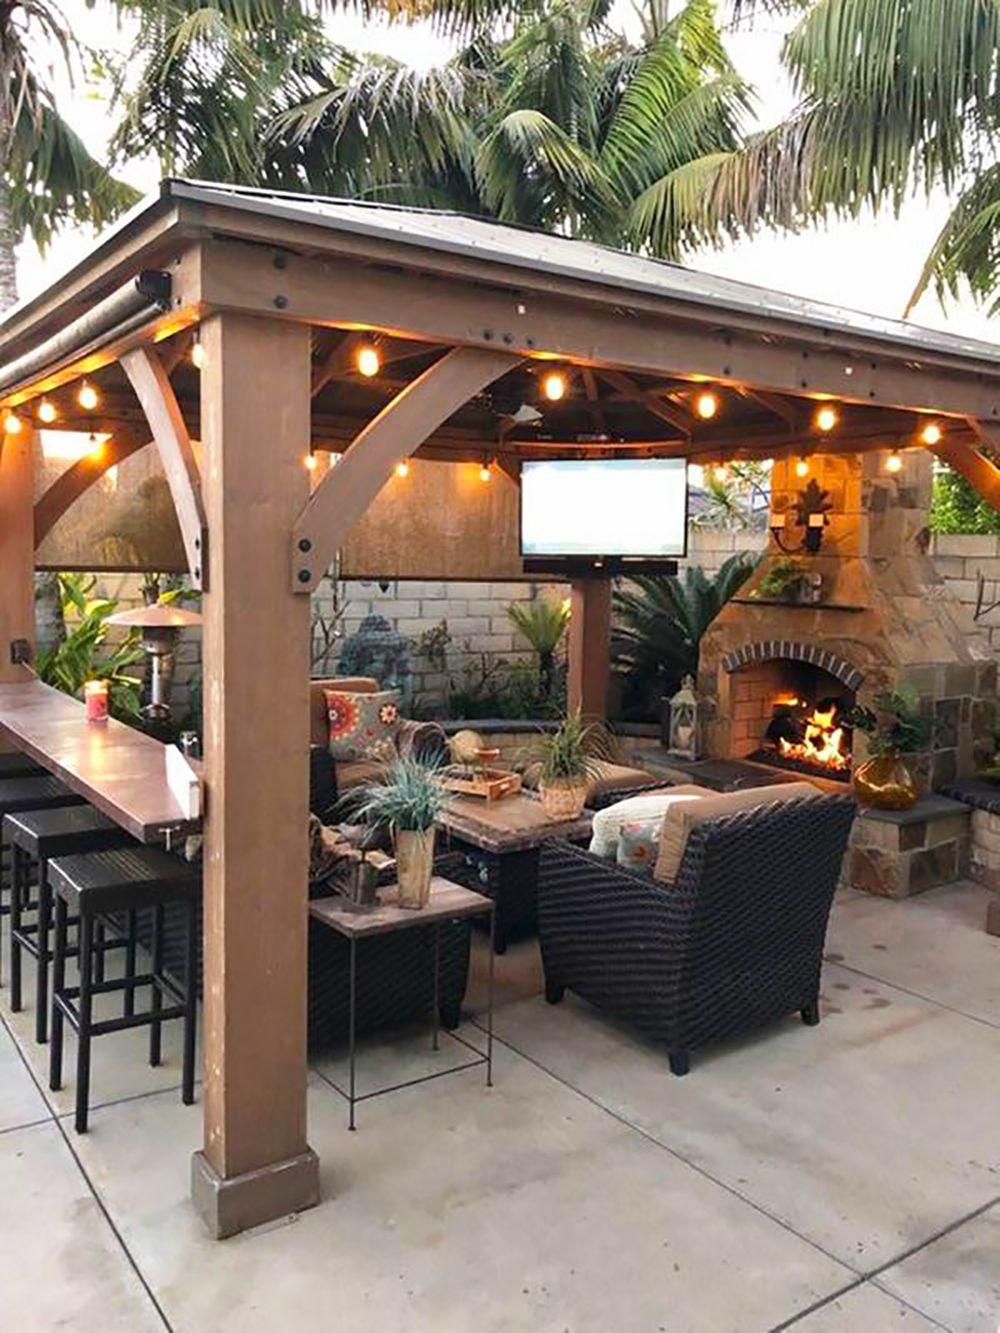 10 Inspiring Outdoor Bar Ideas 🍹 - Yardistry Structures ... on Yardistry Backyard Pavilion id=48801